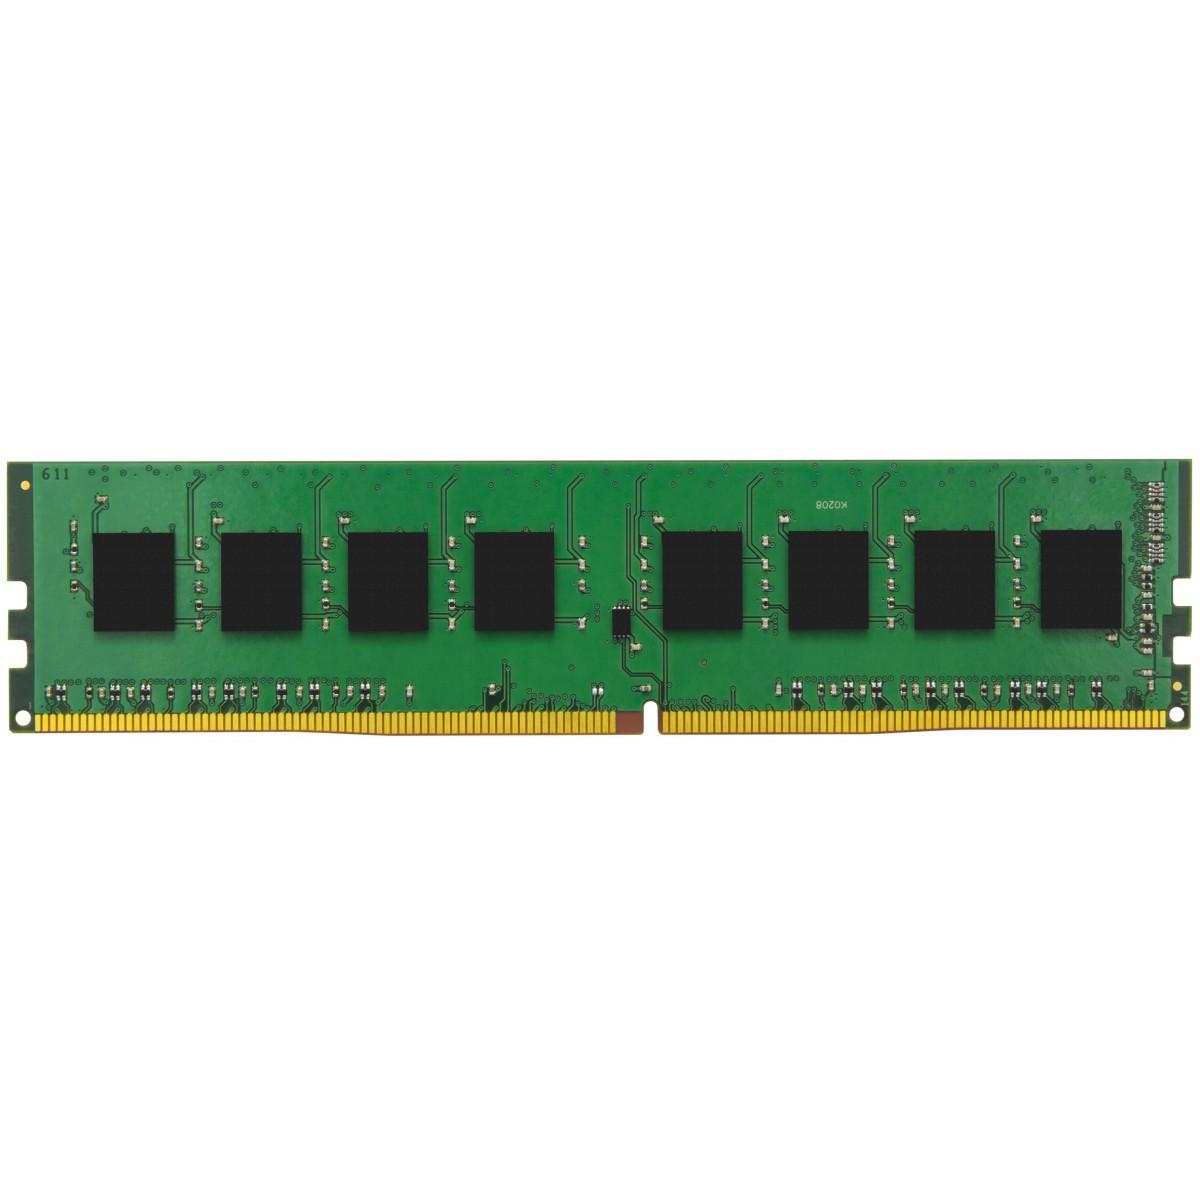 Memória DDR4 Kingston 4GB, 2400Mhz, KVR-24N17S6/4